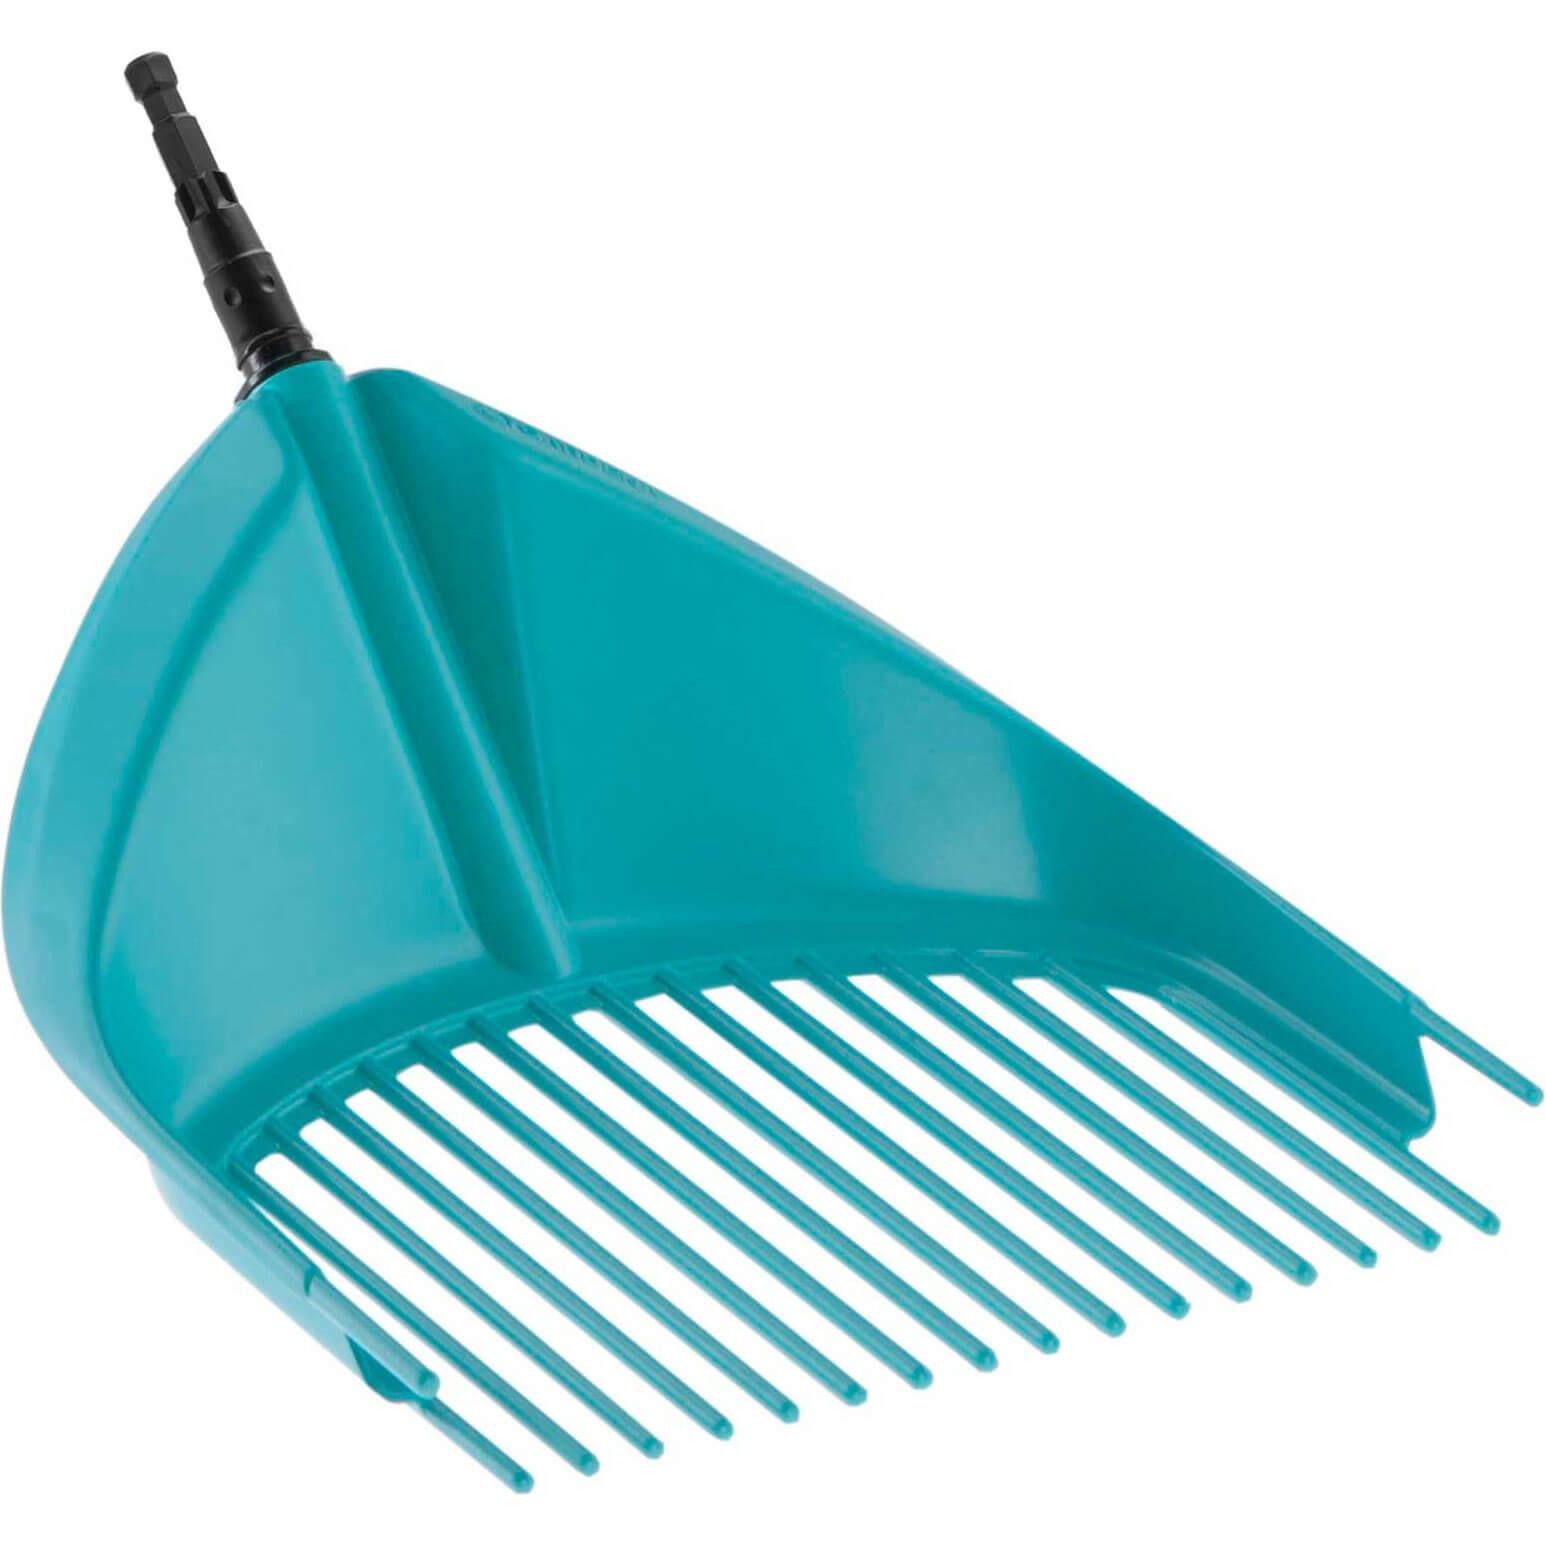 Gardena COMBISYSTEM Shovel Rake Head